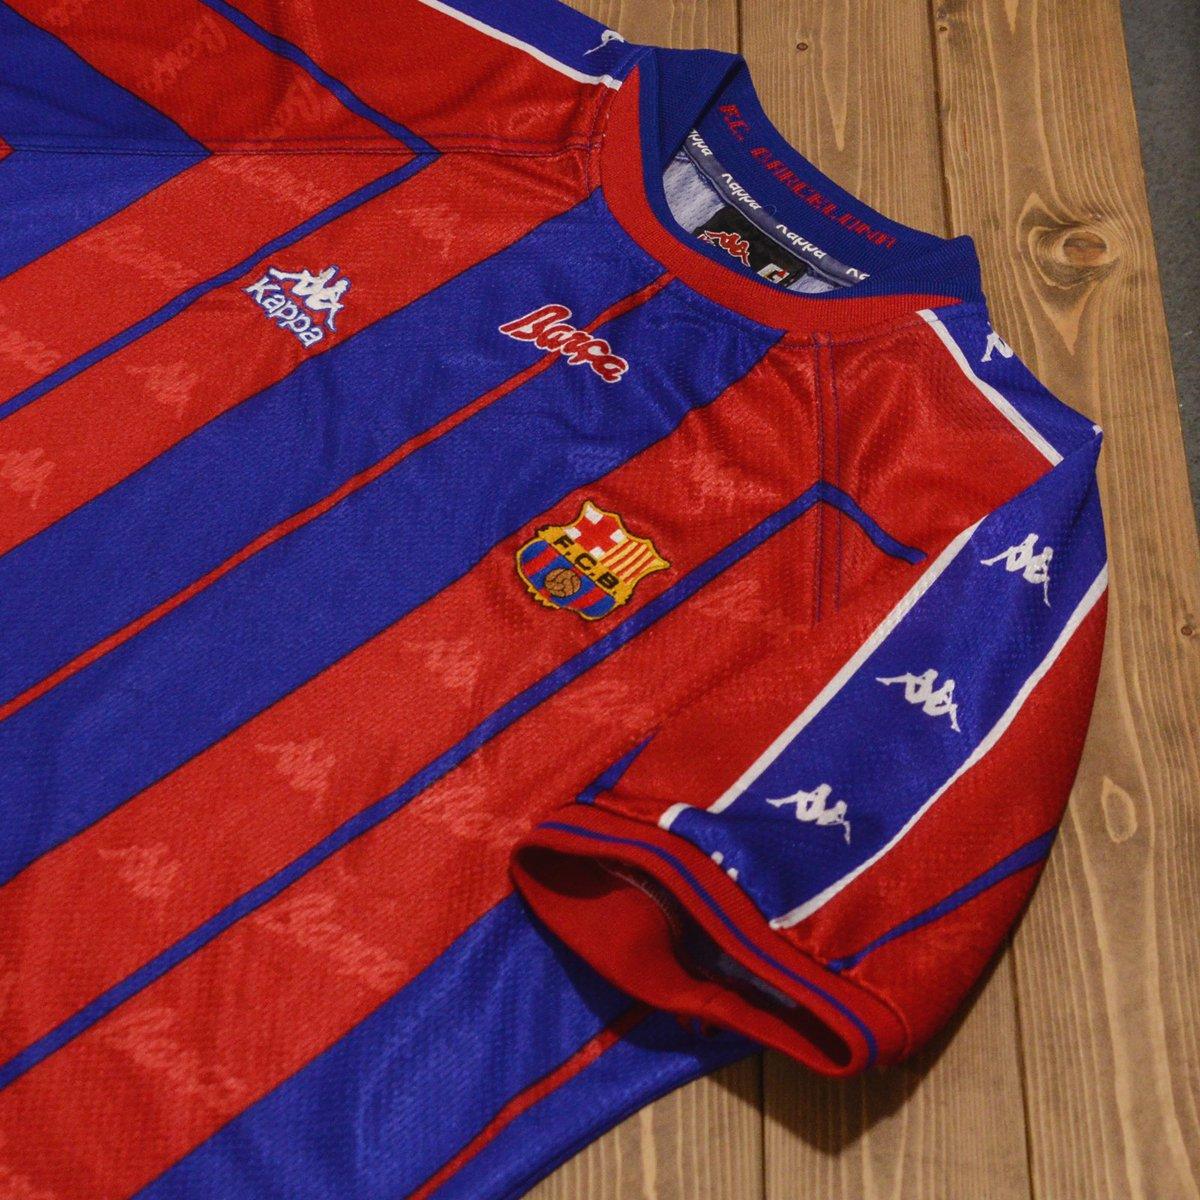 super popular 7a9b8 067ef Classic Football Shirts on Twitter: